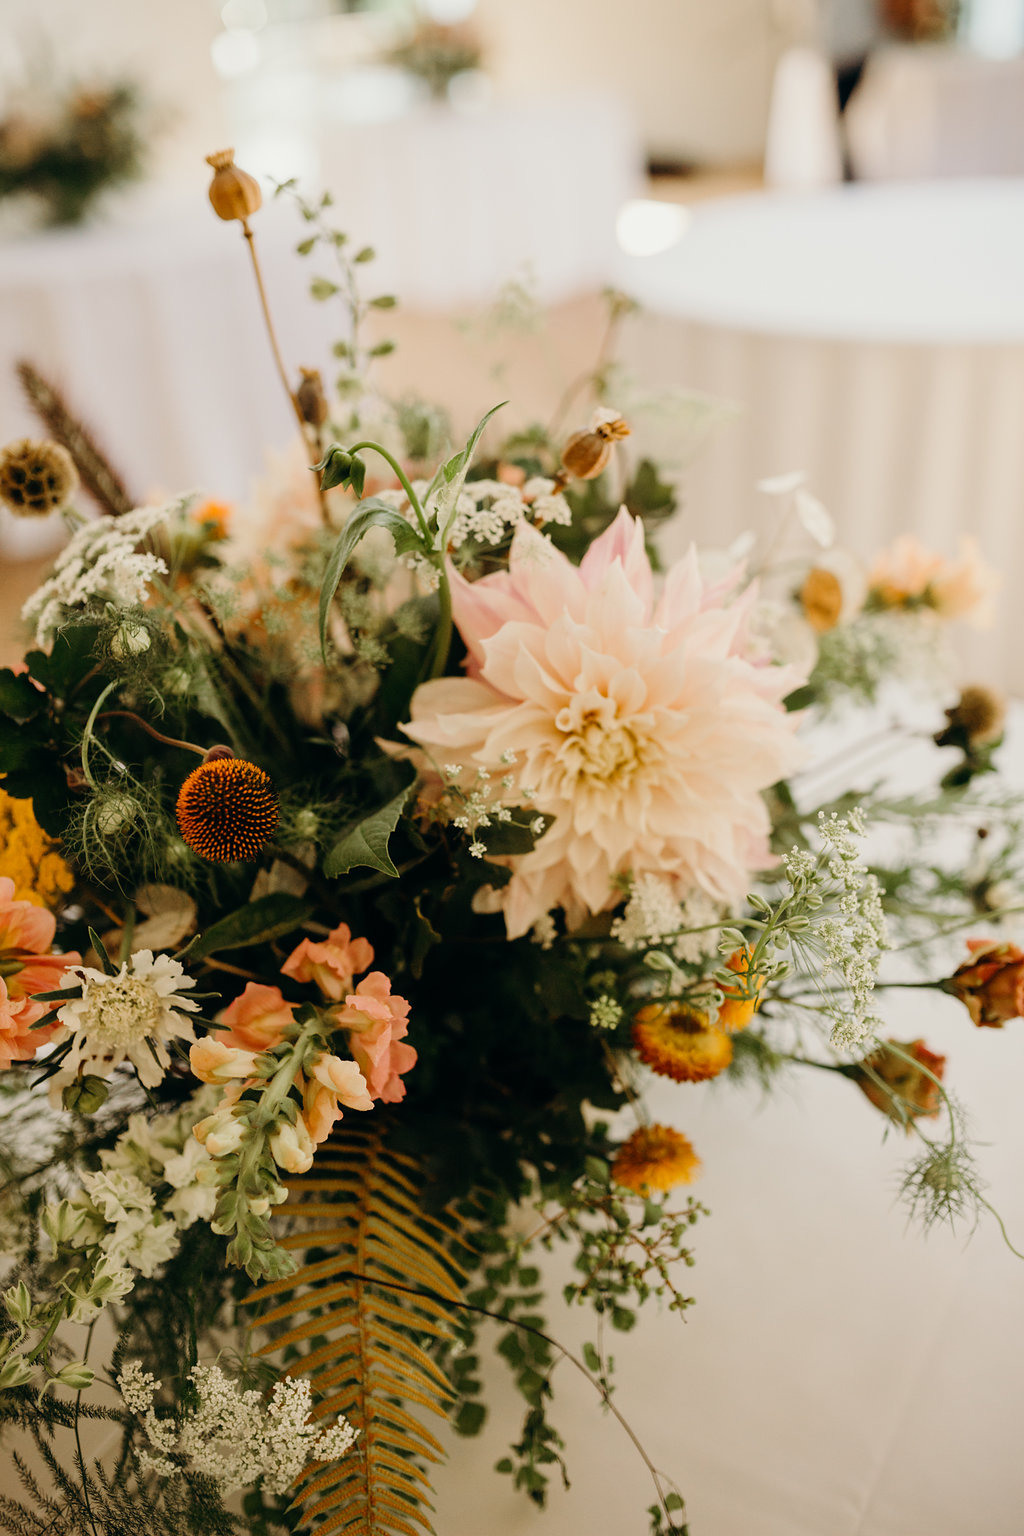 stephanie-green-wedding-photography-sula-oliver-2018-69.jpg